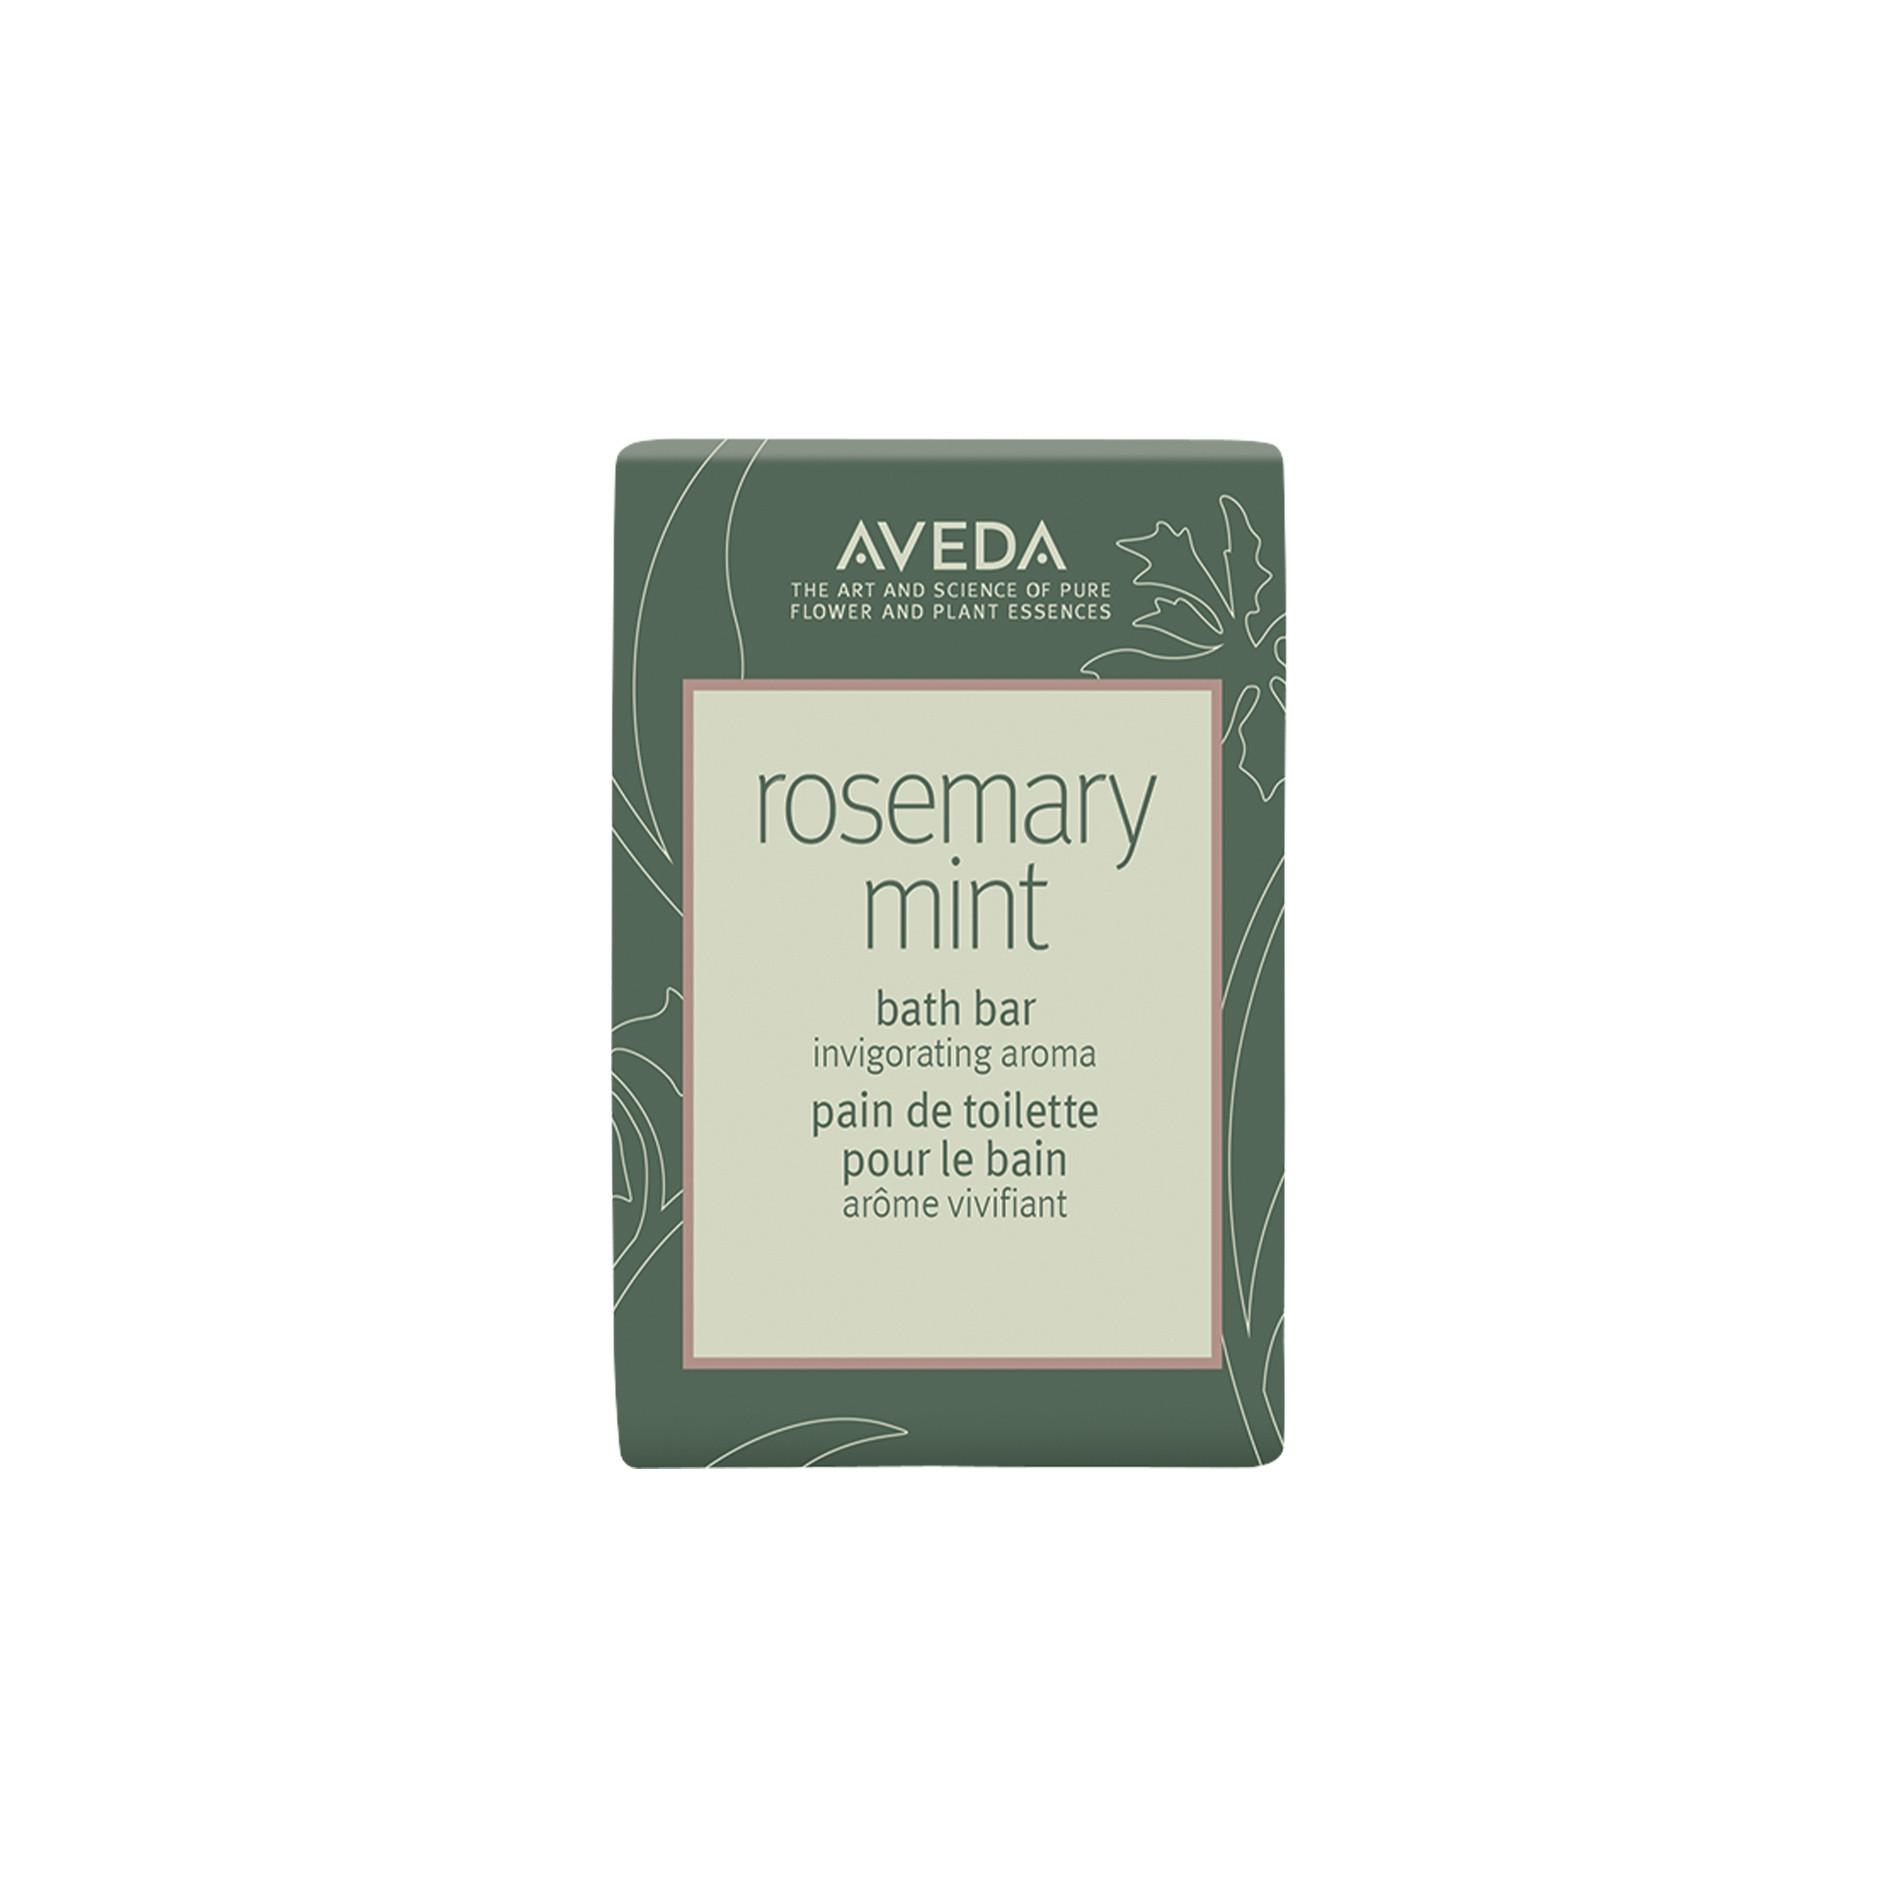 Aveda rosemary mint saponetta bagno200 g, Verde, large image number 0